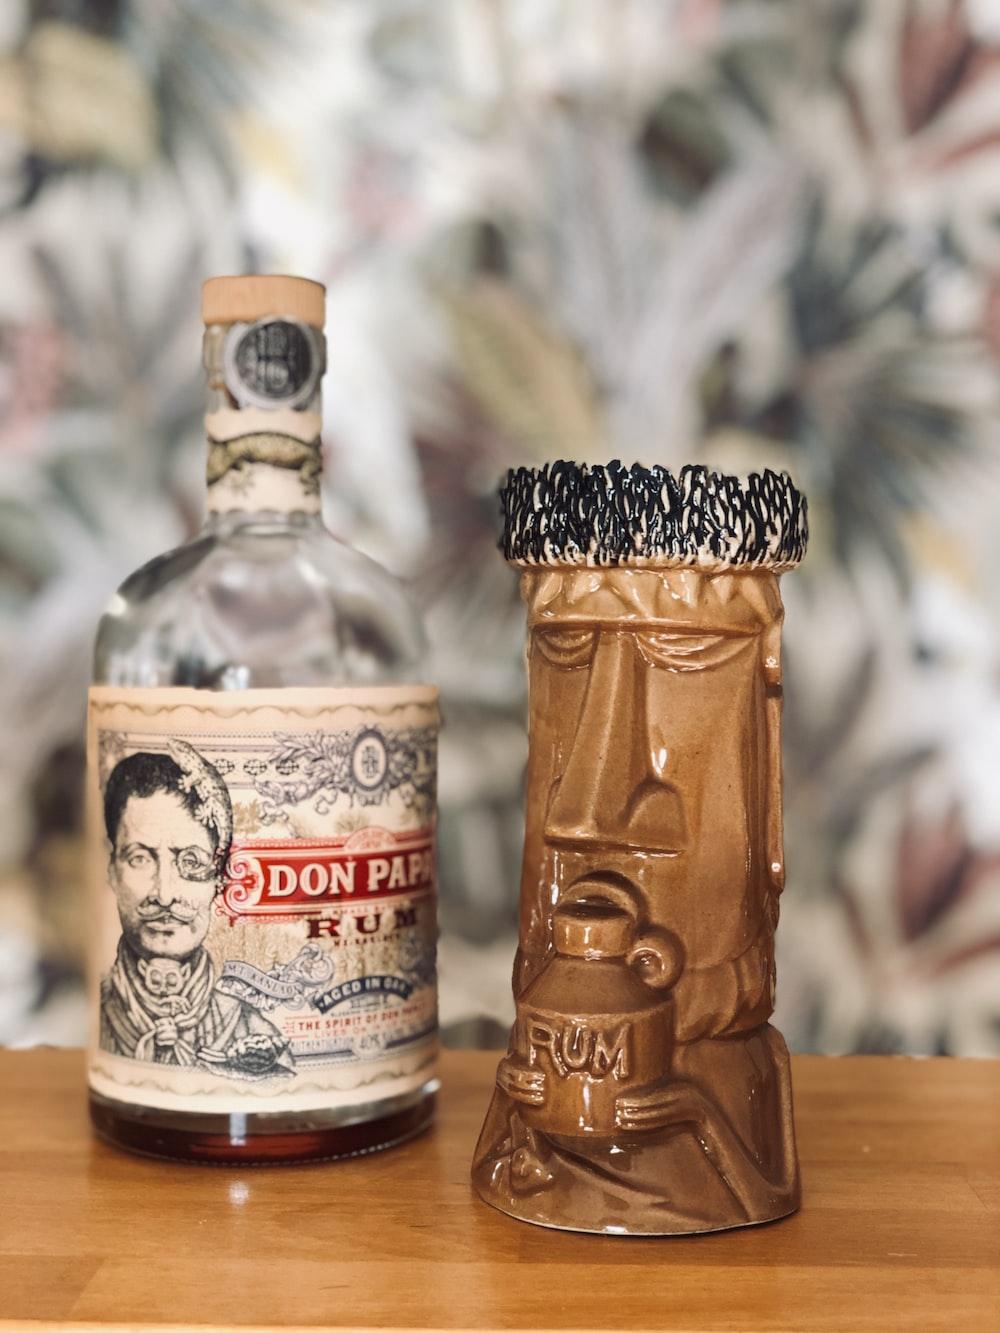 jack daniels bottle on brown wooden table